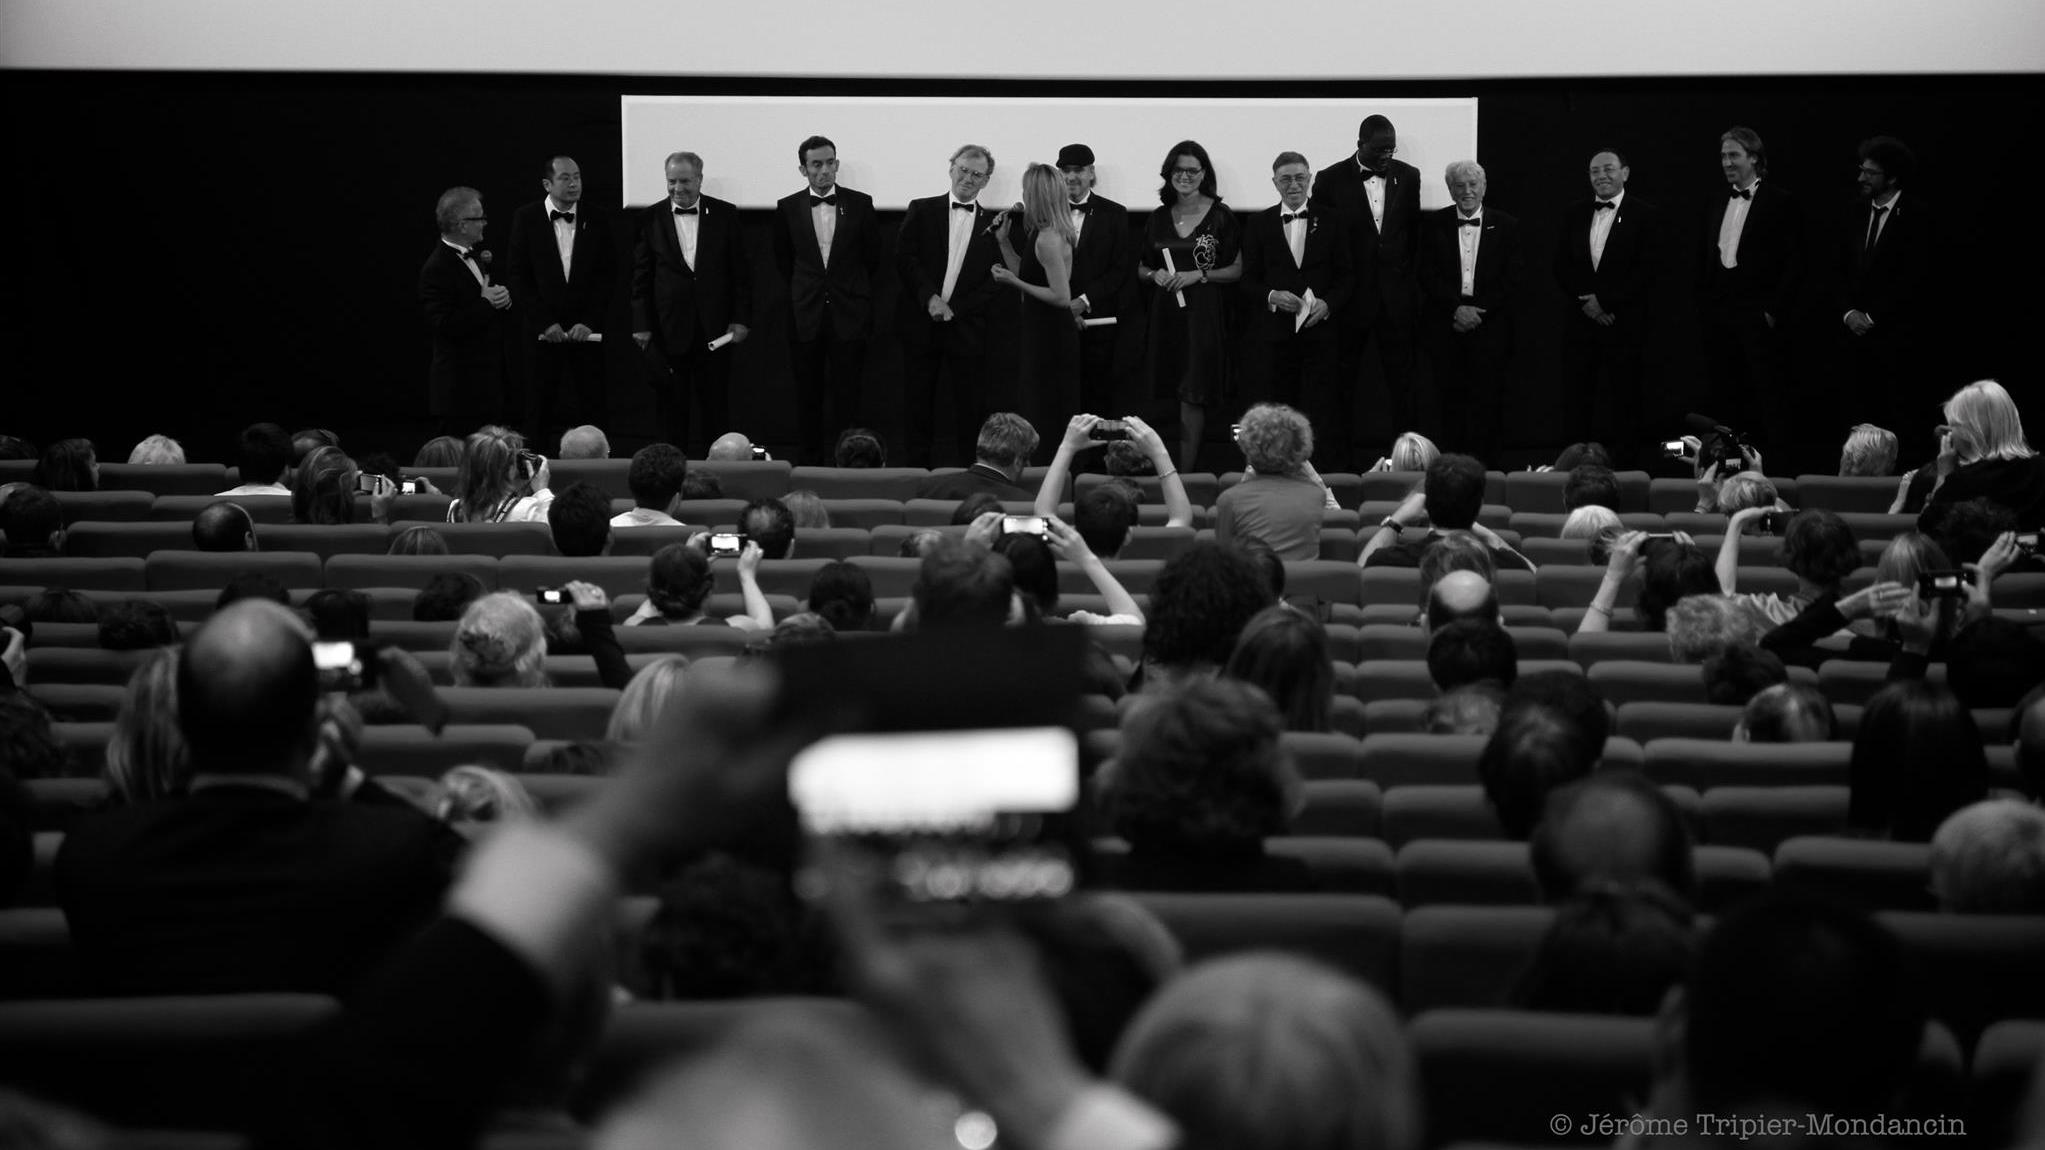 Cannes_2014_-_CARICATURISTES_39-1517744227-1518255035.jpg